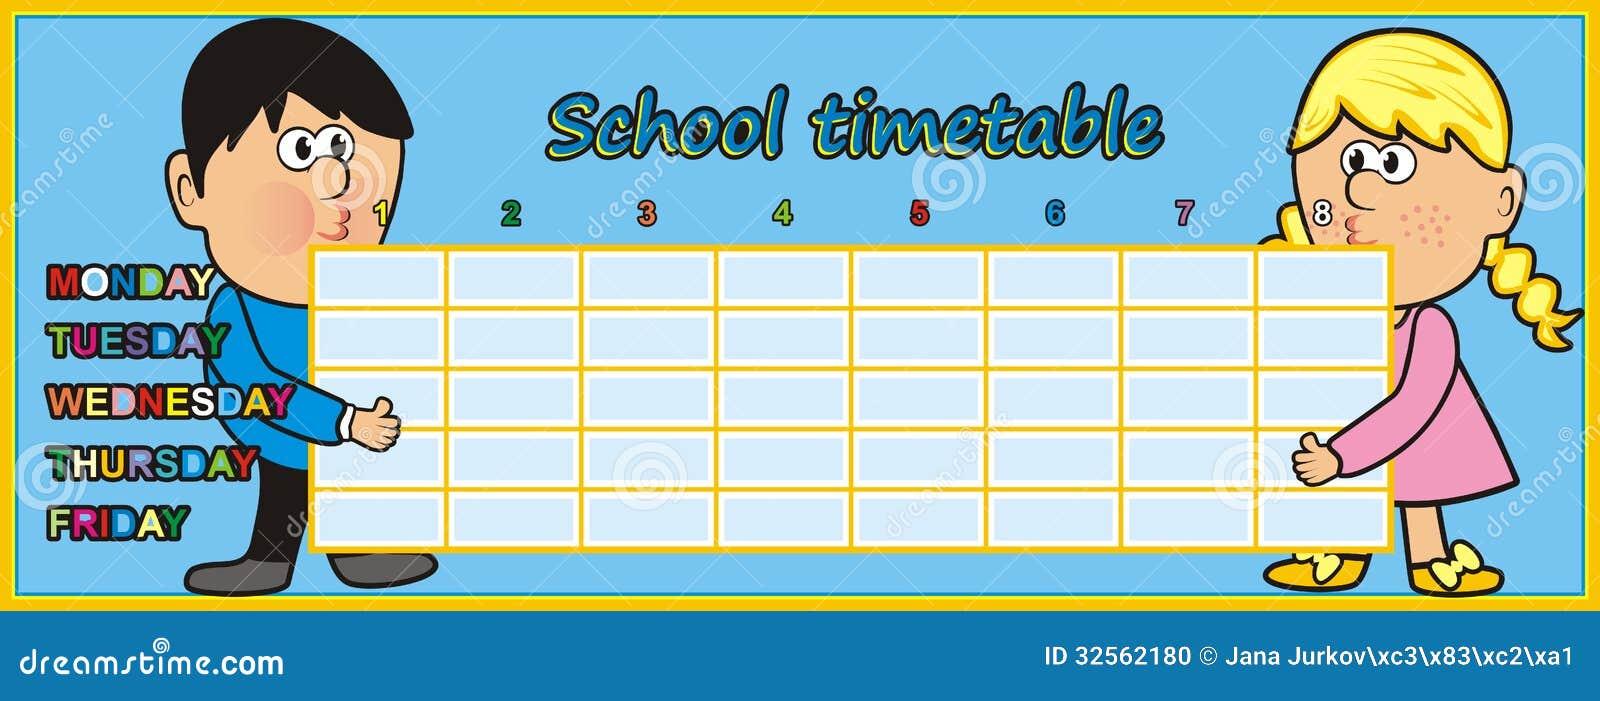 Resultado de imagen de timetable for kids